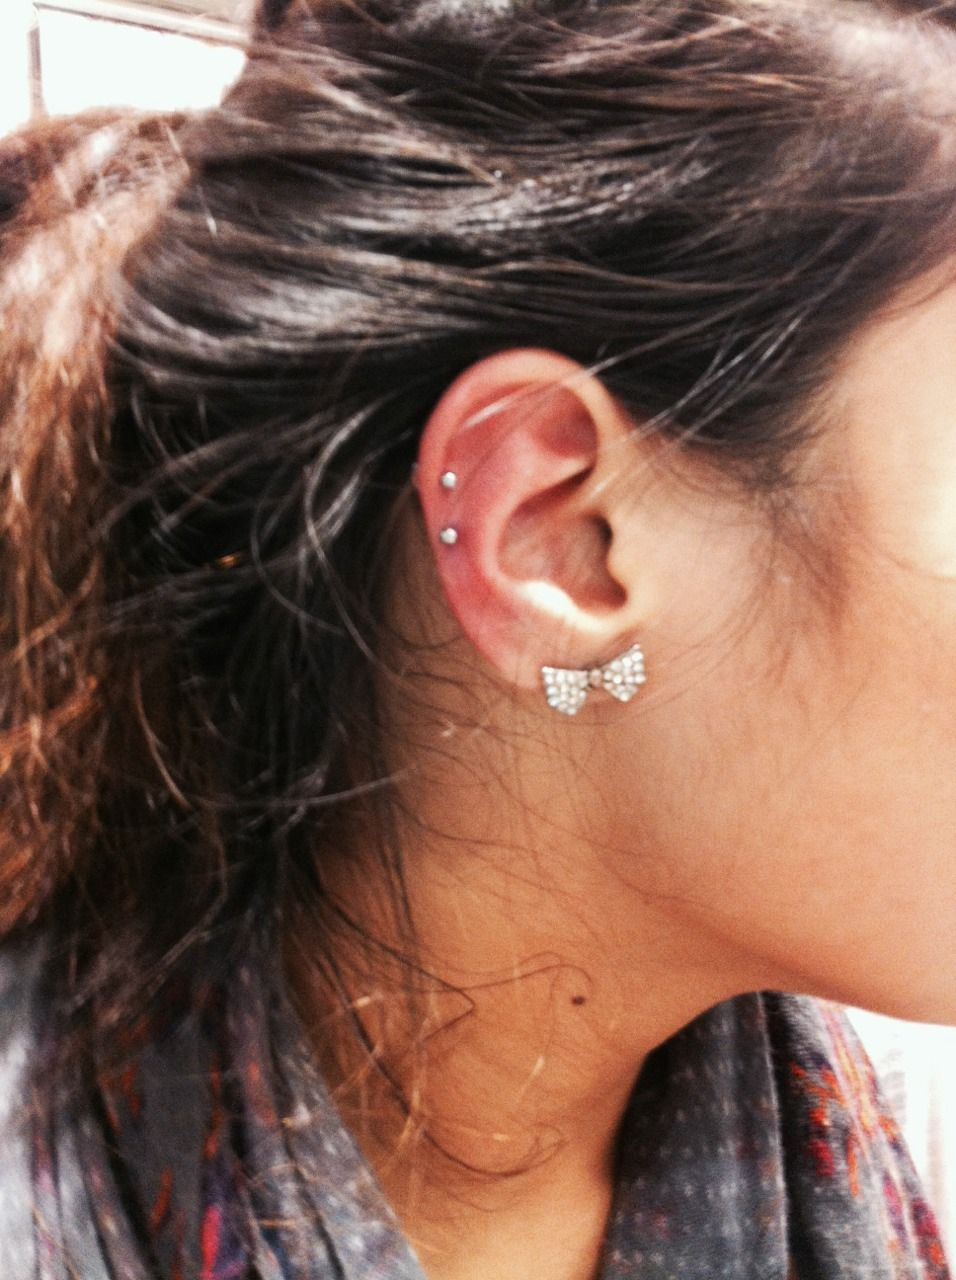 Names for cartilage piercing  Double cartilage piercing studs  Summer wardrobe  Pinterest